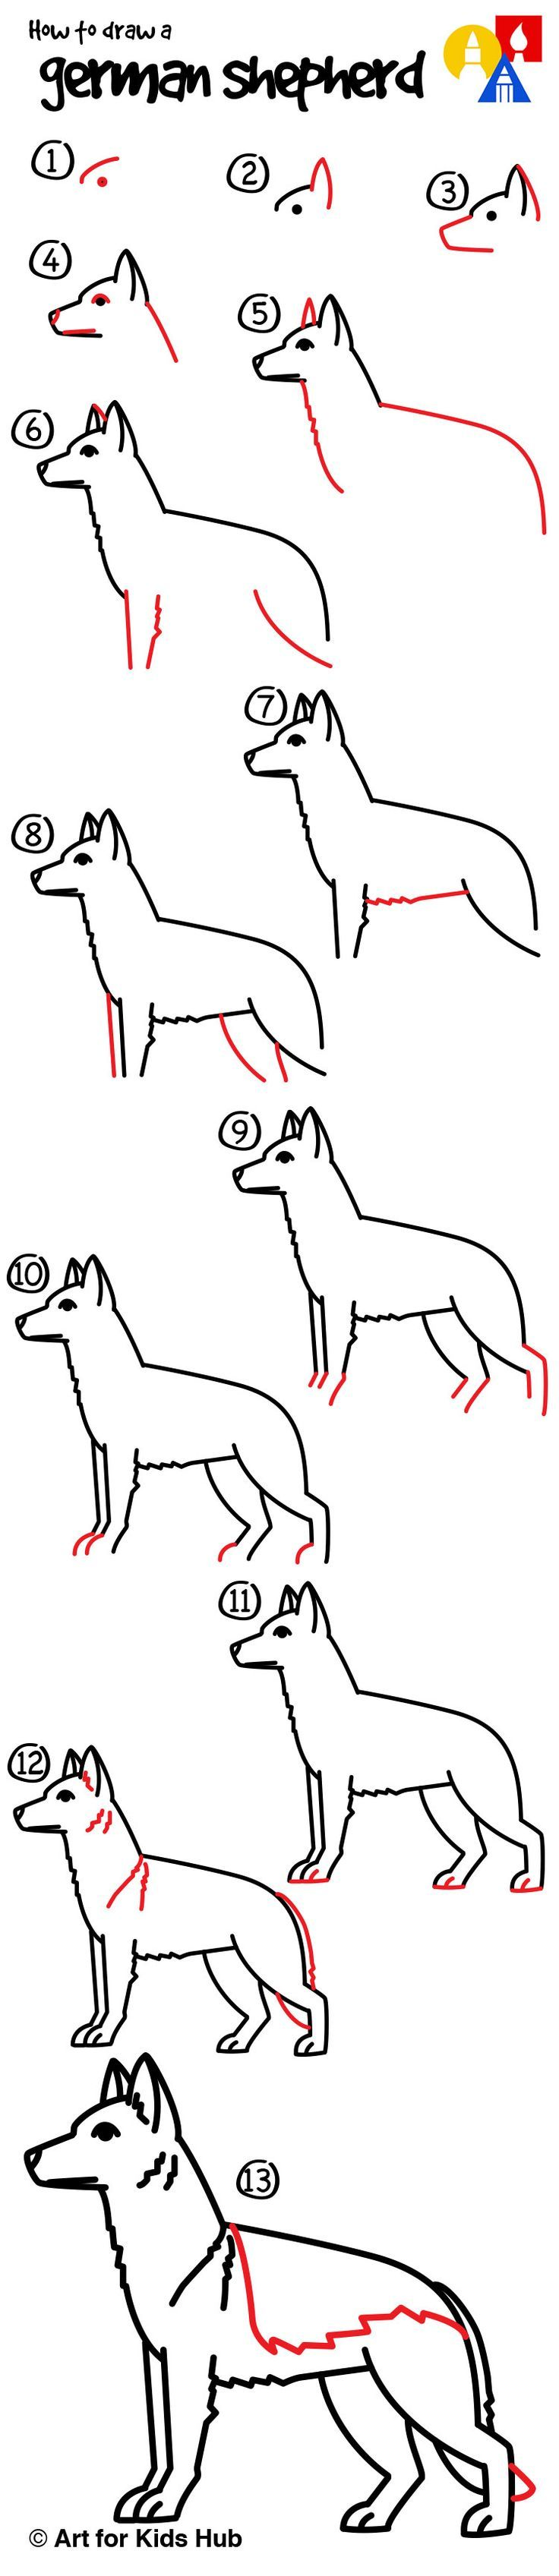 how to draw a german shepherd art for kids hub german